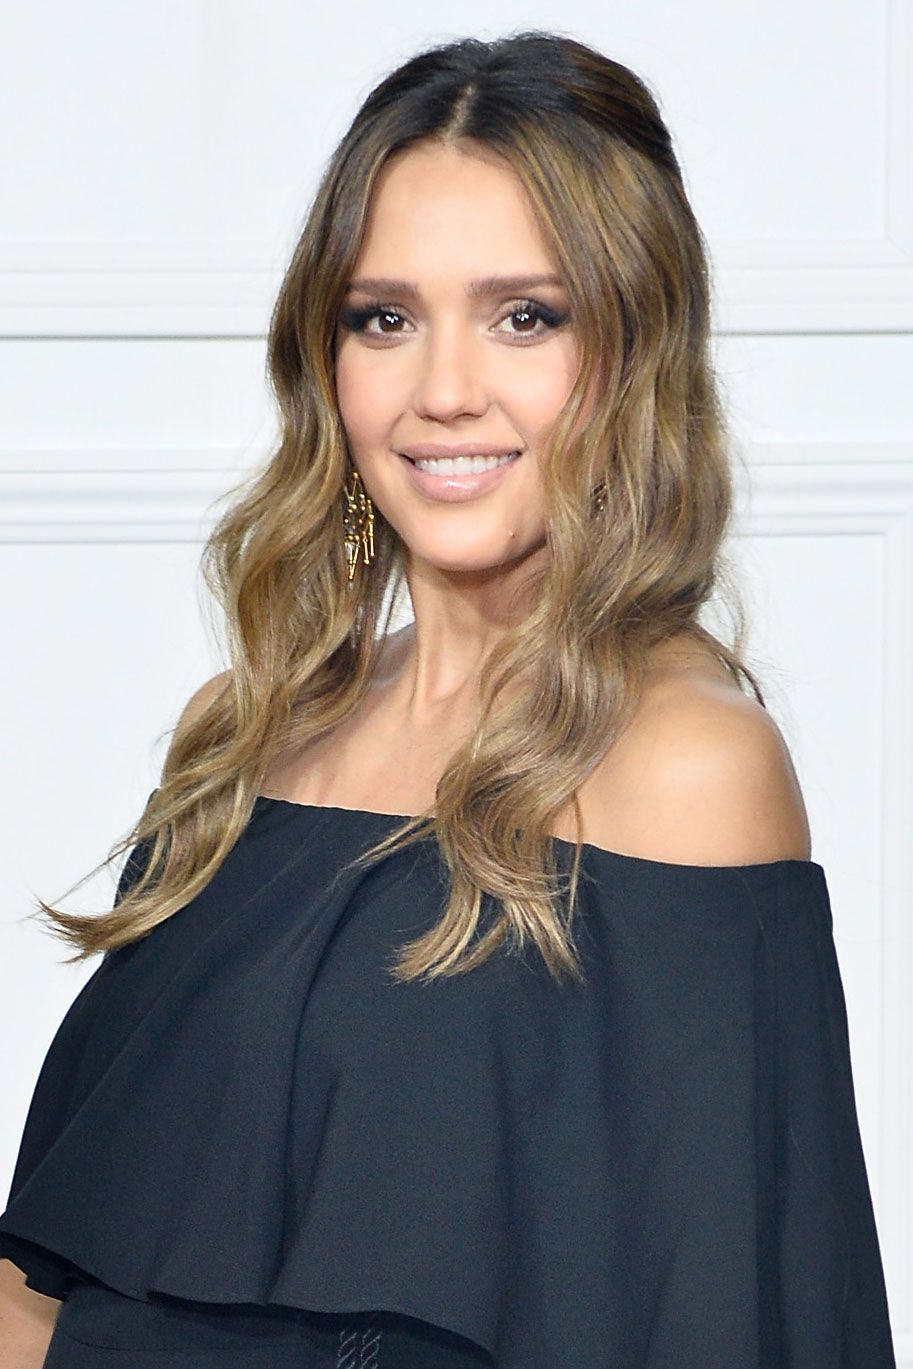 10 Easy Hairstyles For Women Quick Hairdo Ideas 2018